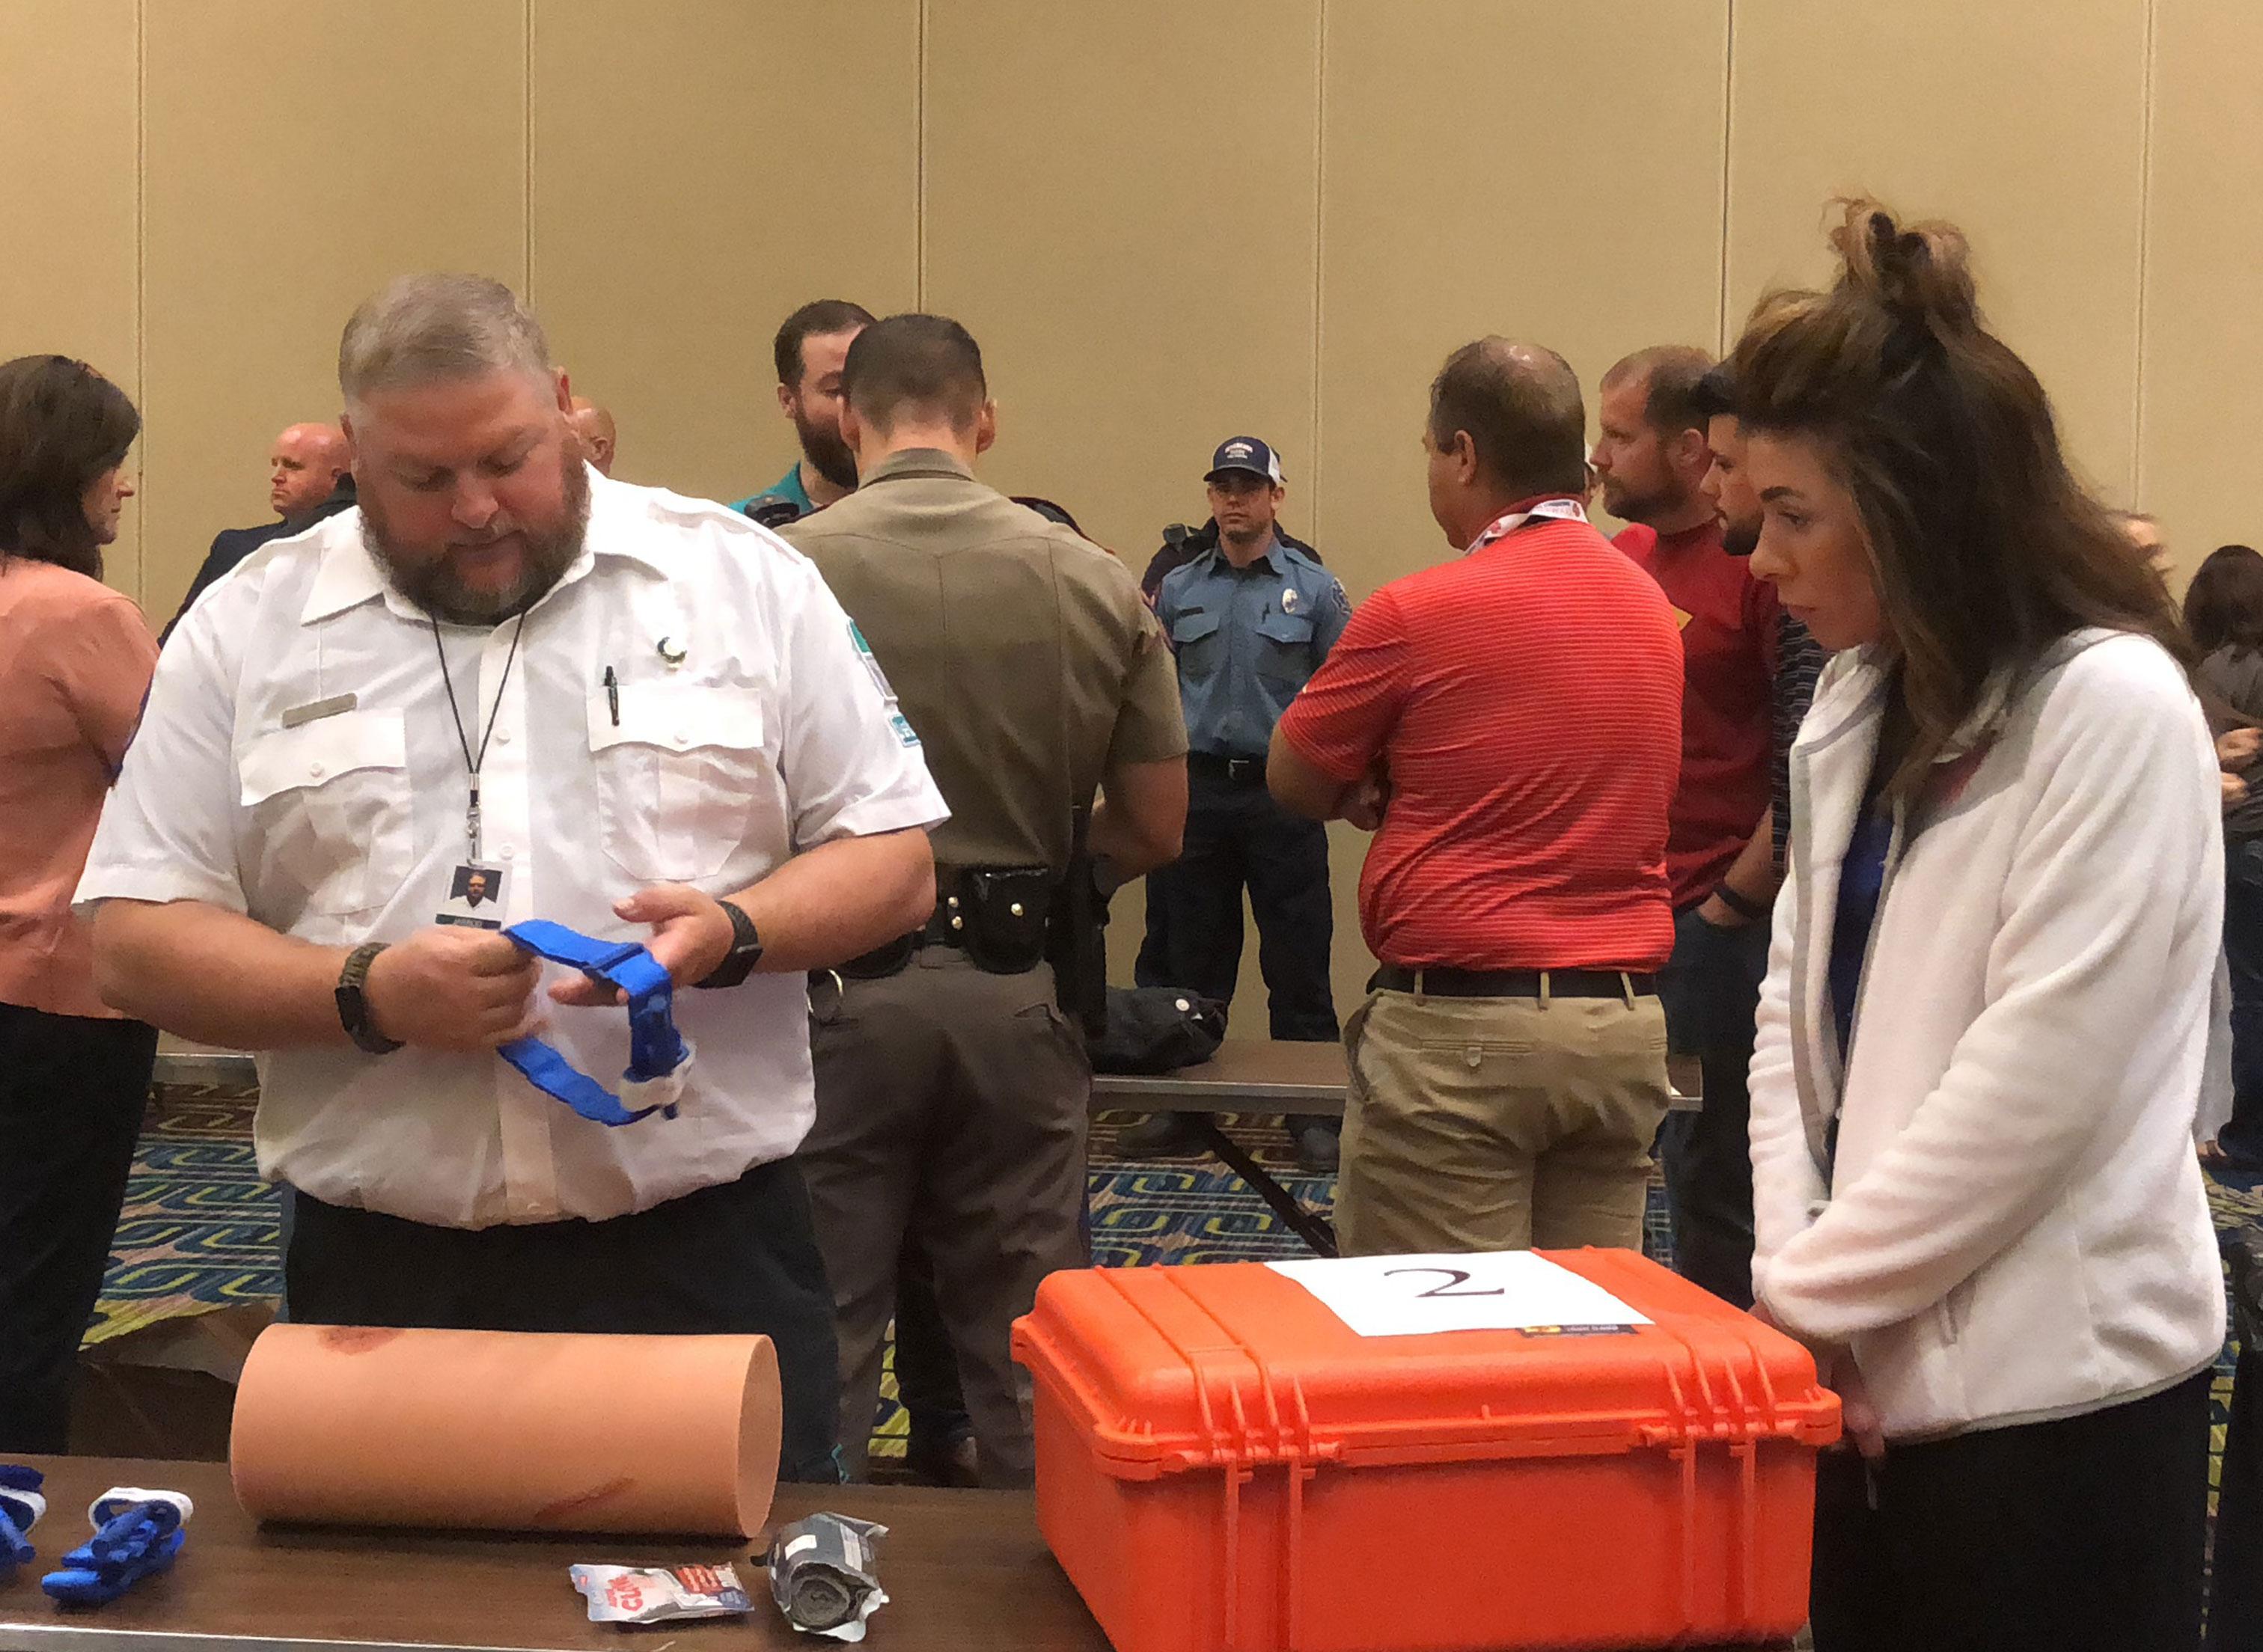 Jarod Null Teaches Stop the Bleed Training in Texarkana for LifeNet EMS